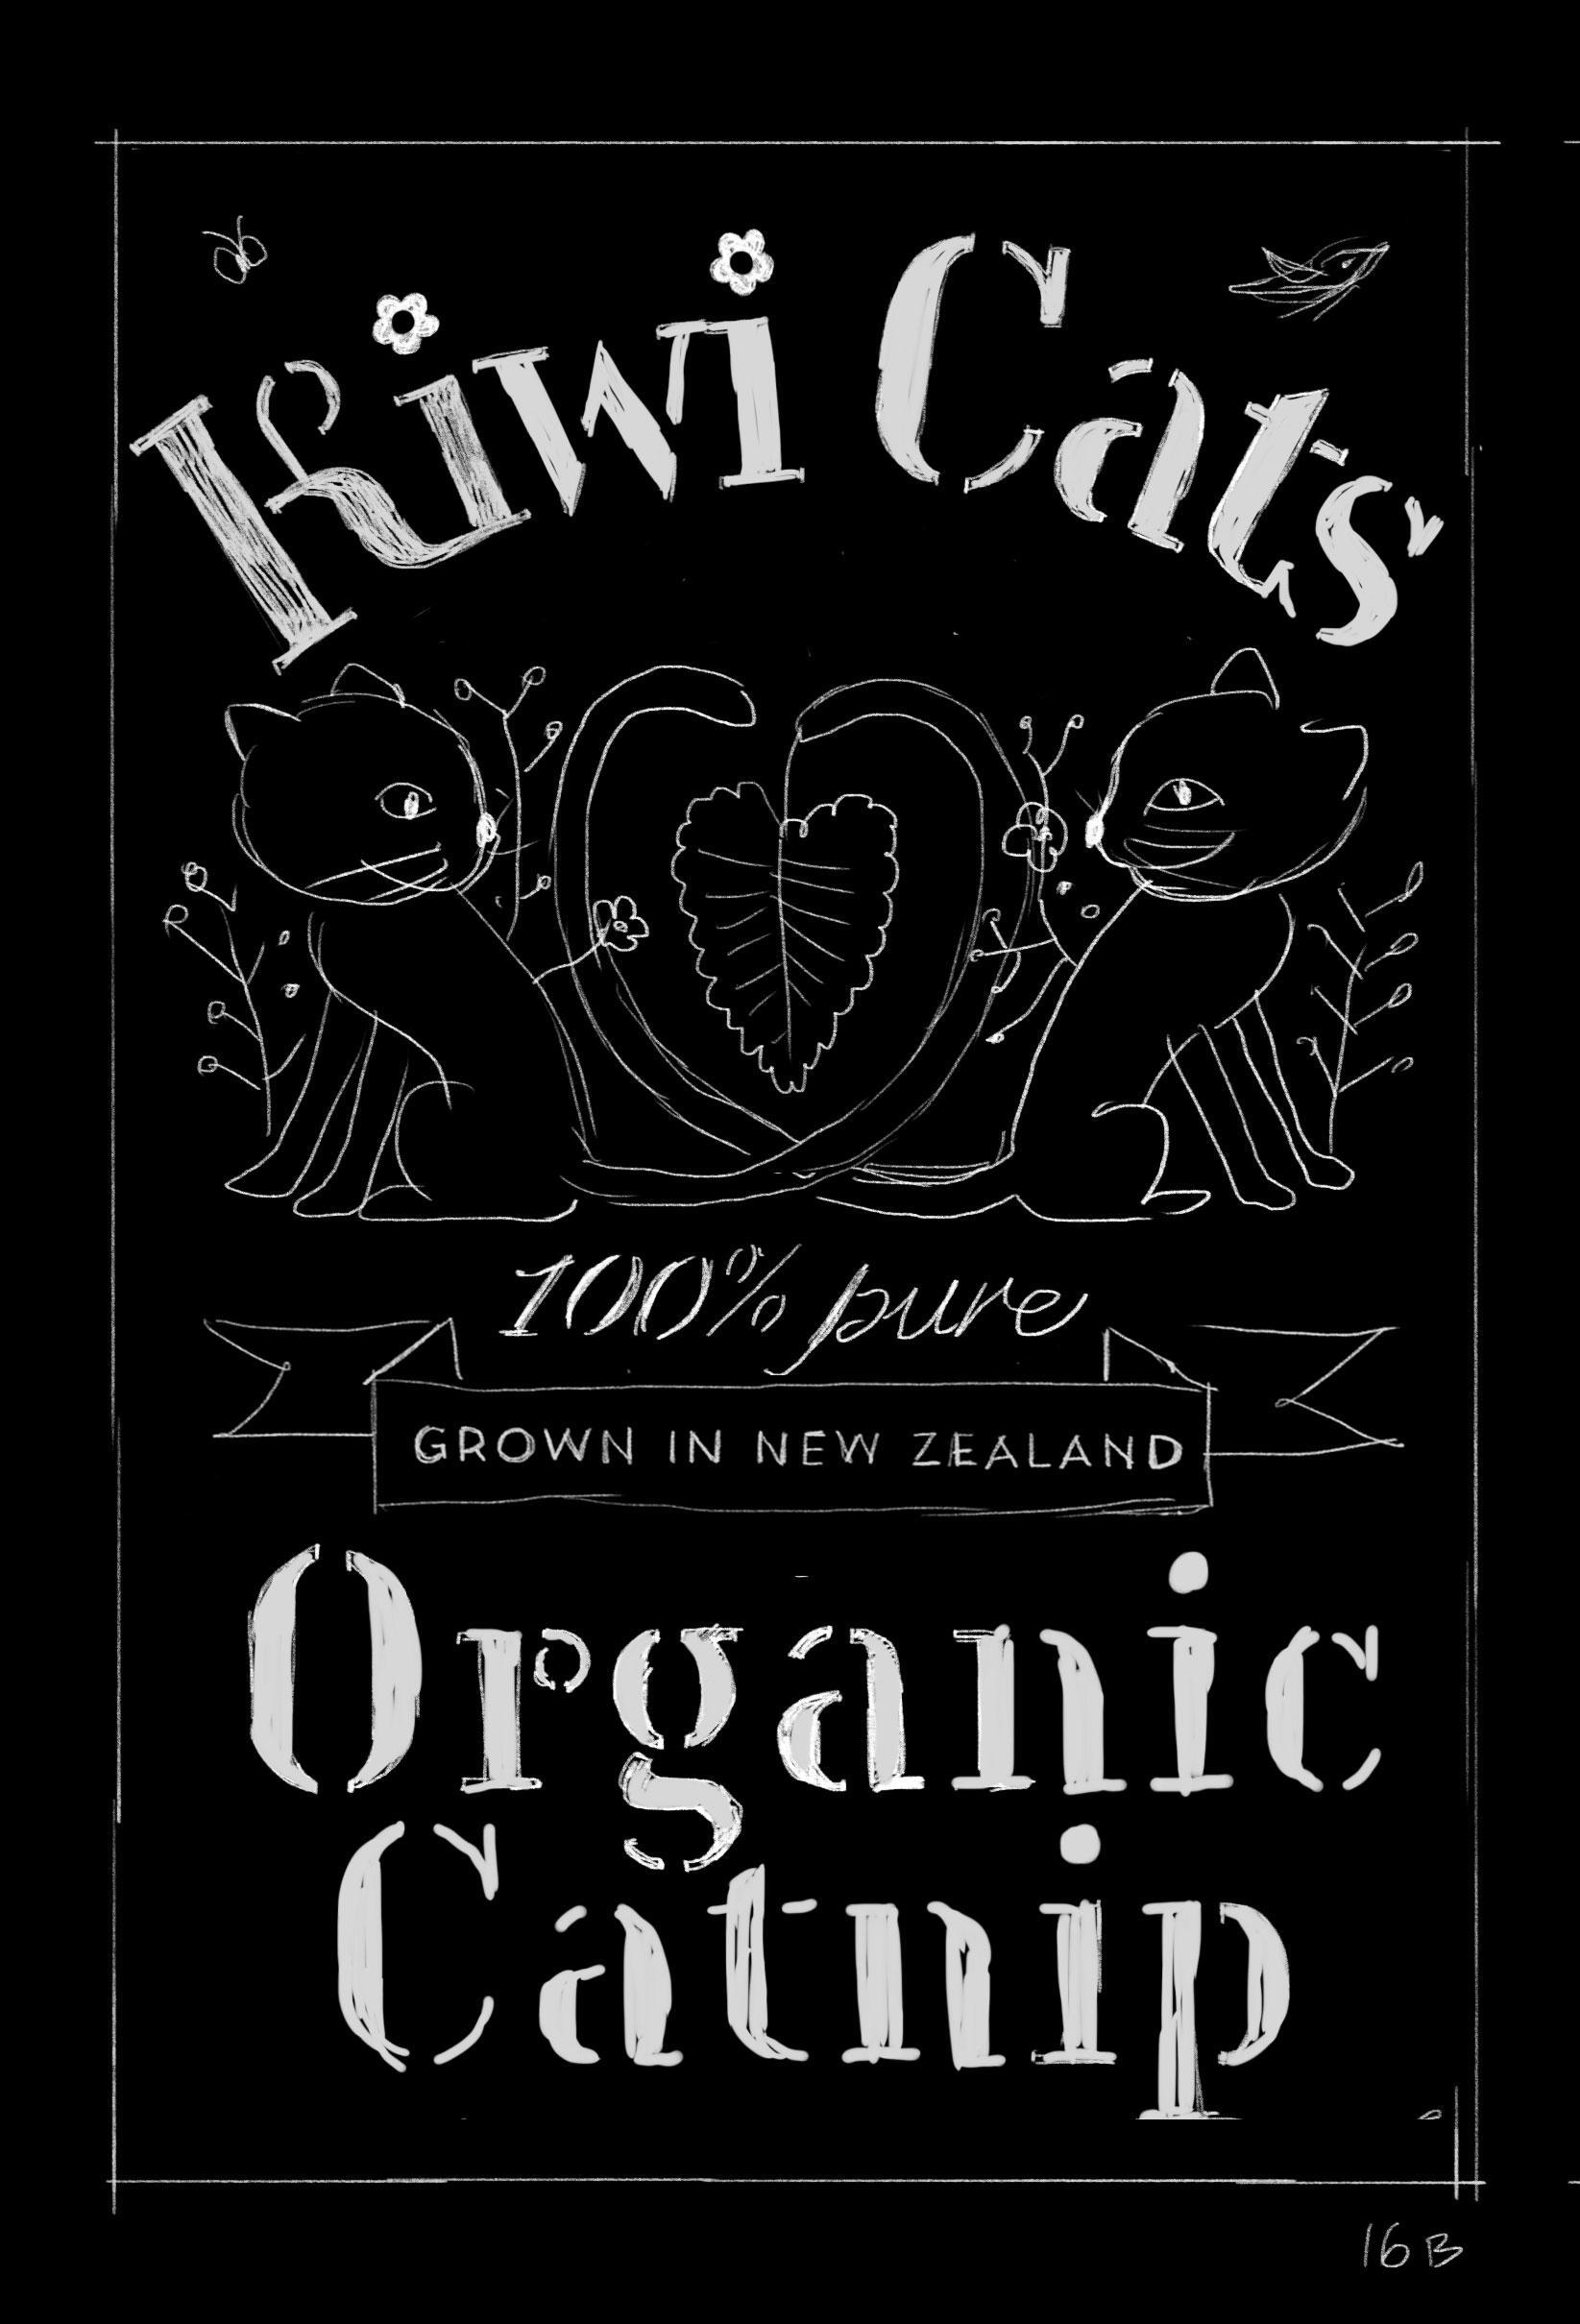 Organic Catnip Label - image 14 - student project